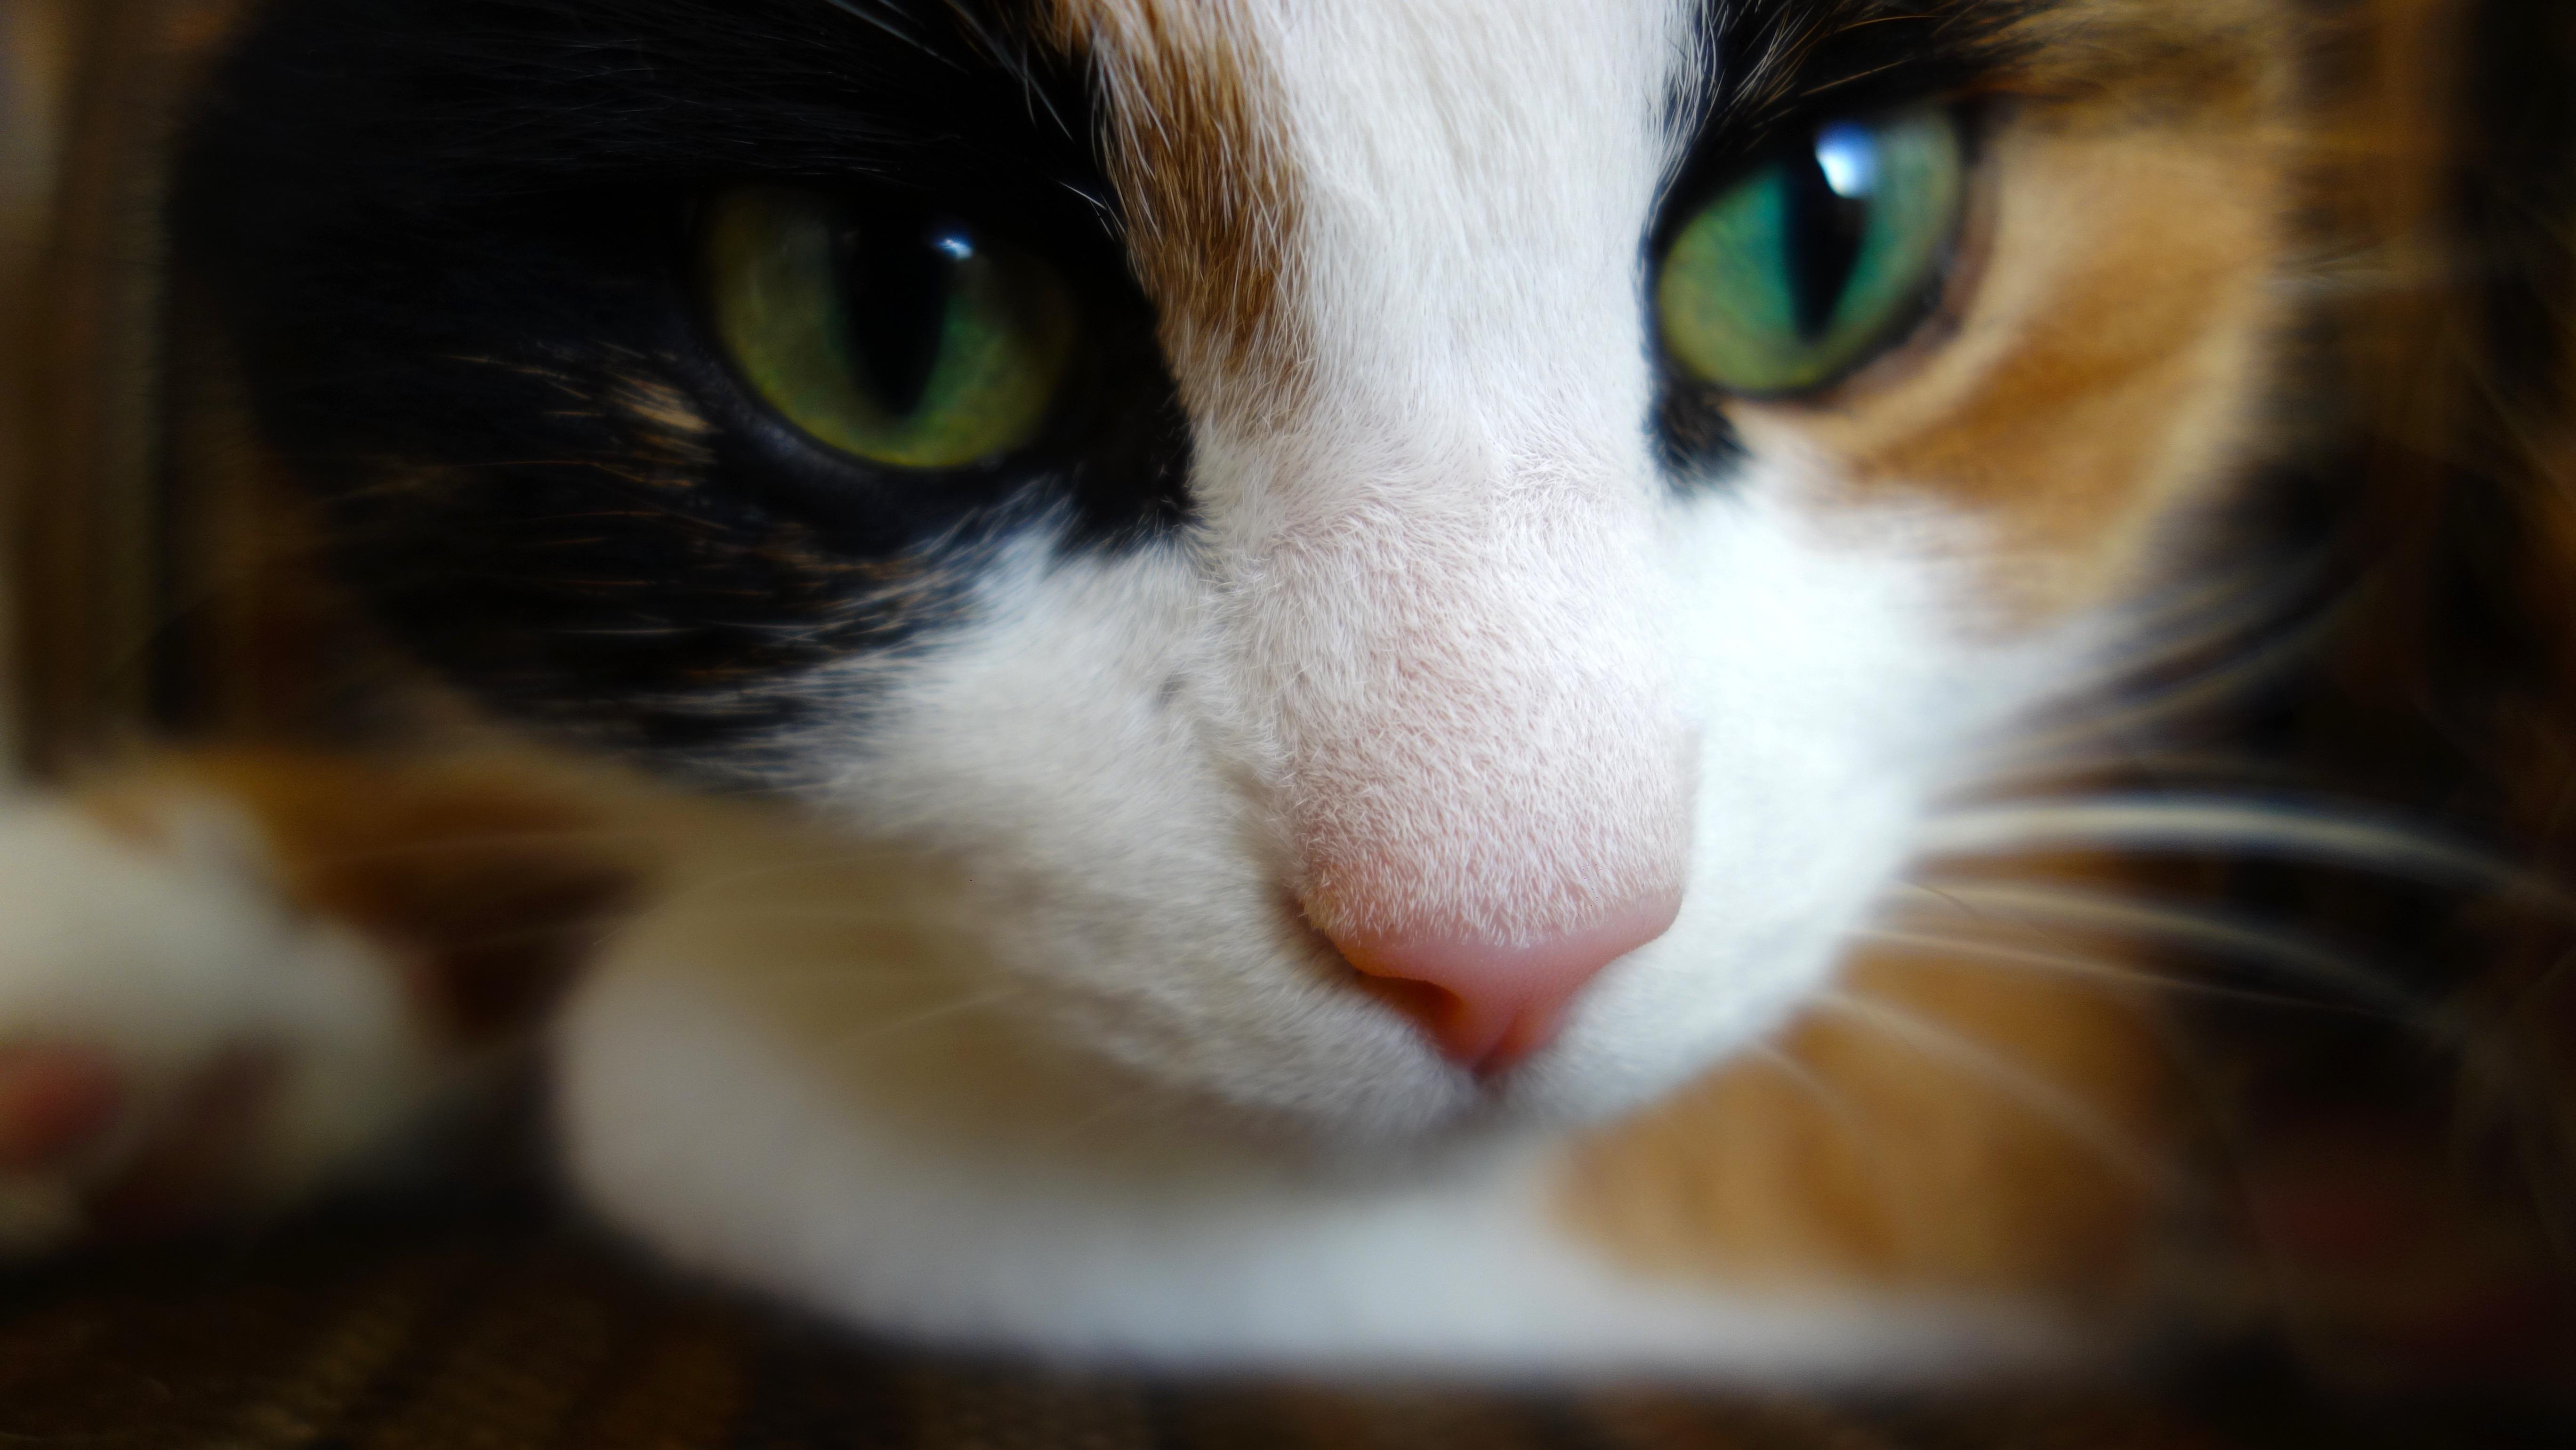 Fotos gratis : blanco, animal, mascota, gatito, gato, color, de ...